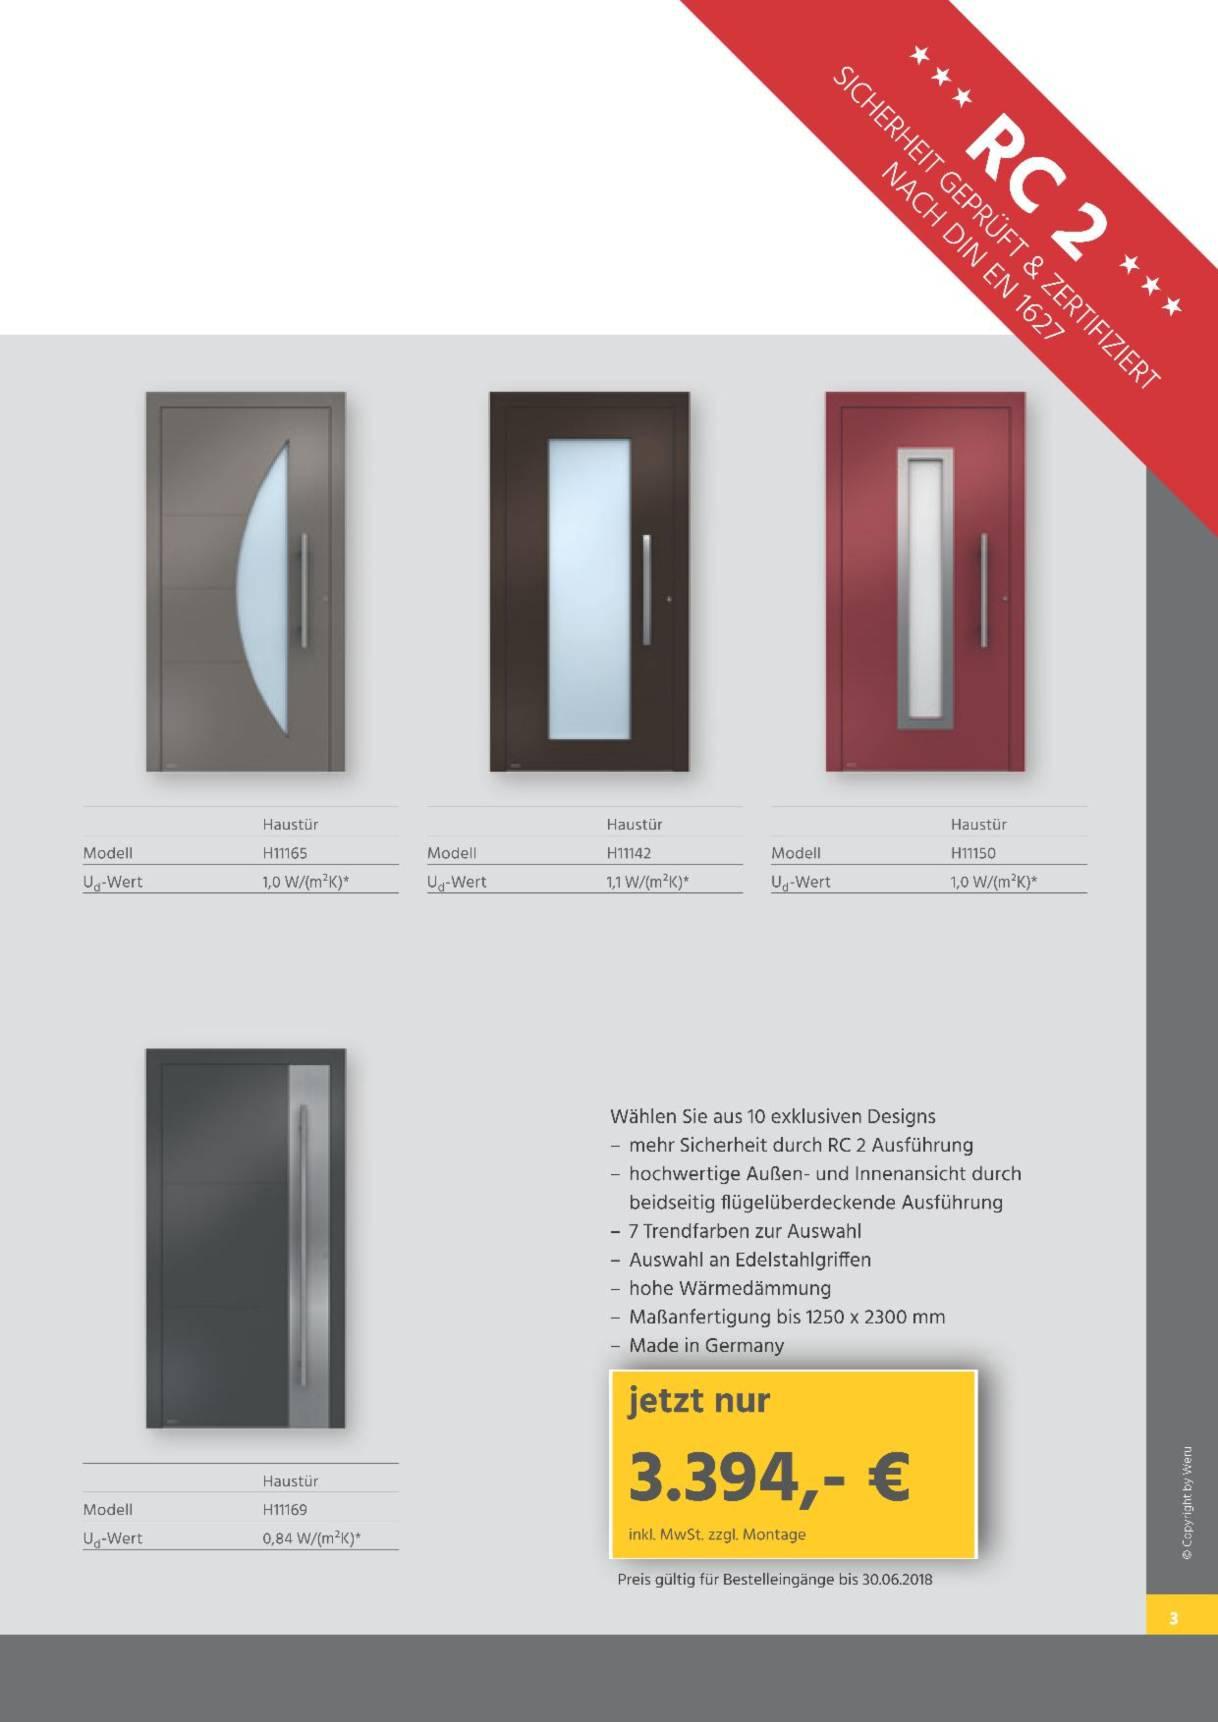 terrassentr holz preis top jalousien berlin aluminium oder holz bis hin zur terrassentr oder. Black Bedroom Furniture Sets. Home Design Ideas